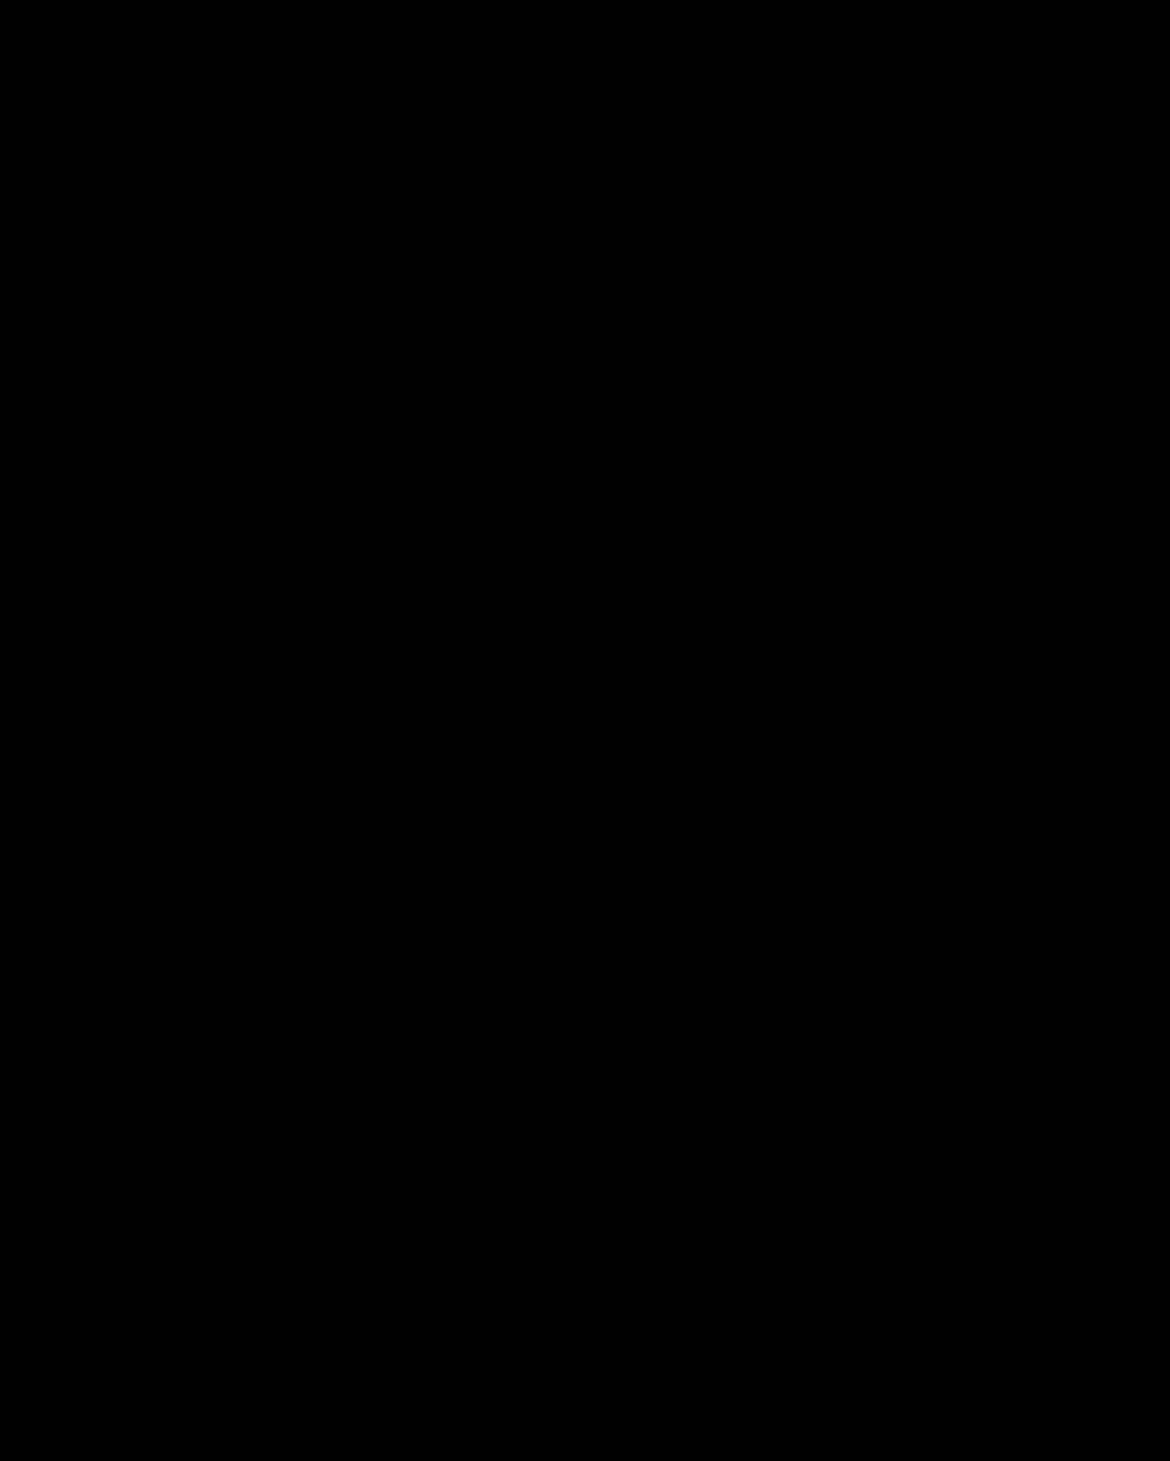 Fashion Week di Milano e Parigi 2019: Cosa ho indossato. Laura Comolli indossa Moncler total look e scarpe Casadei